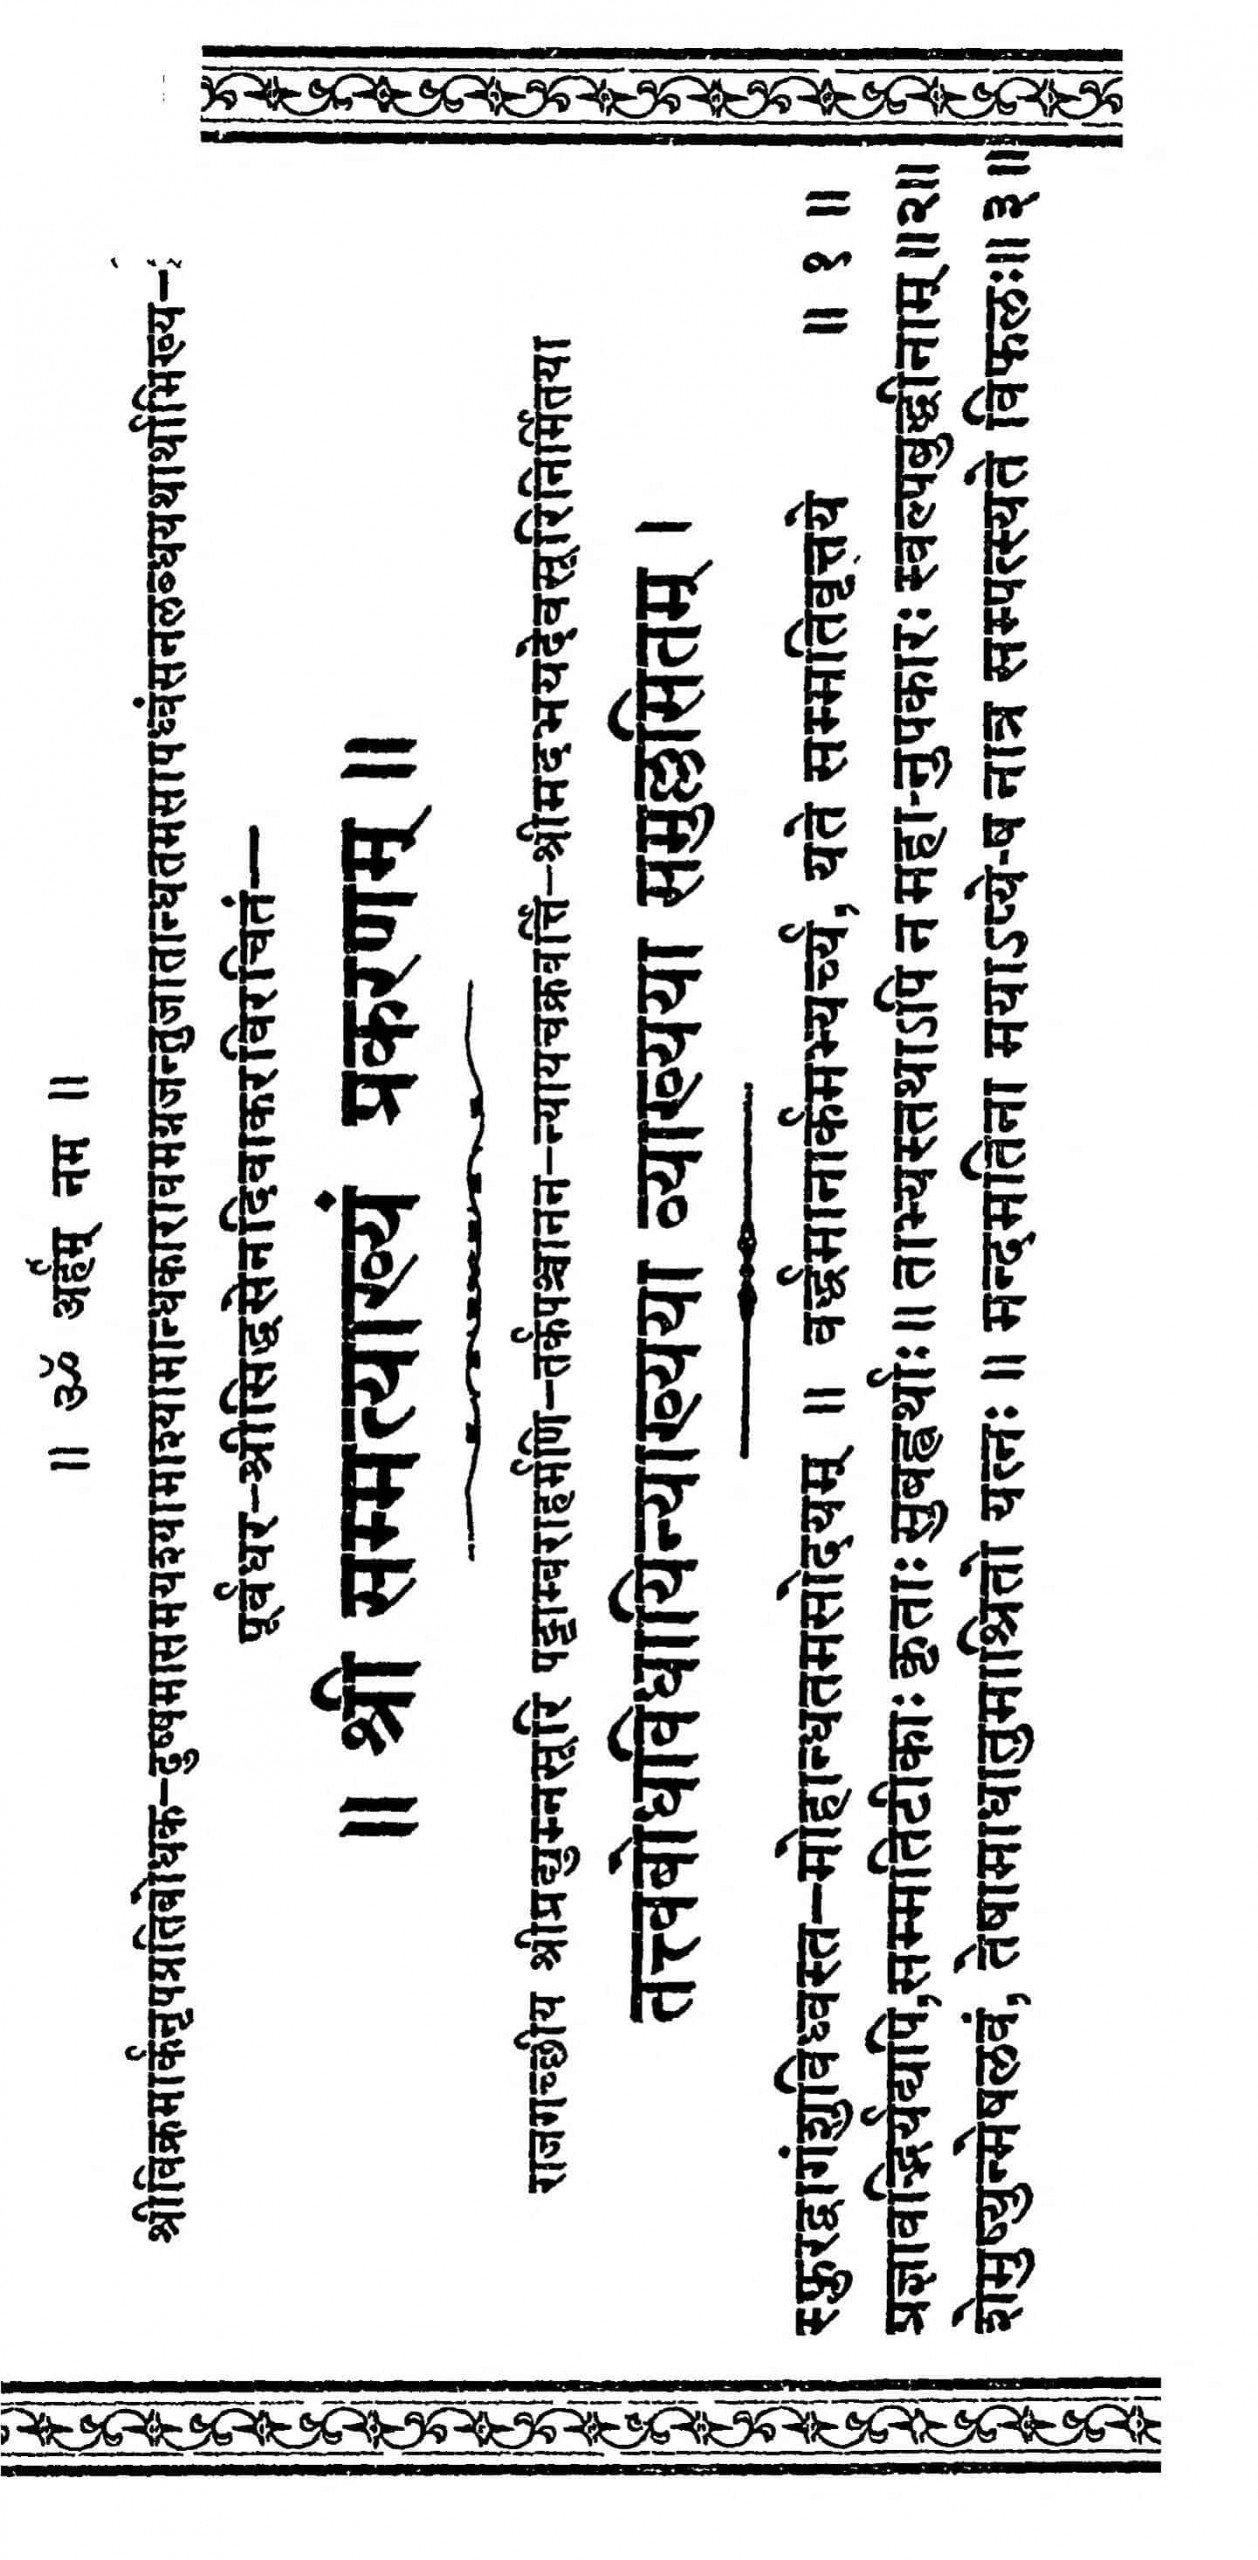 Book Image : श्री सम्मत्याख्यं प्रकरणम् - Shri Sammatyakhyam Prakarnam